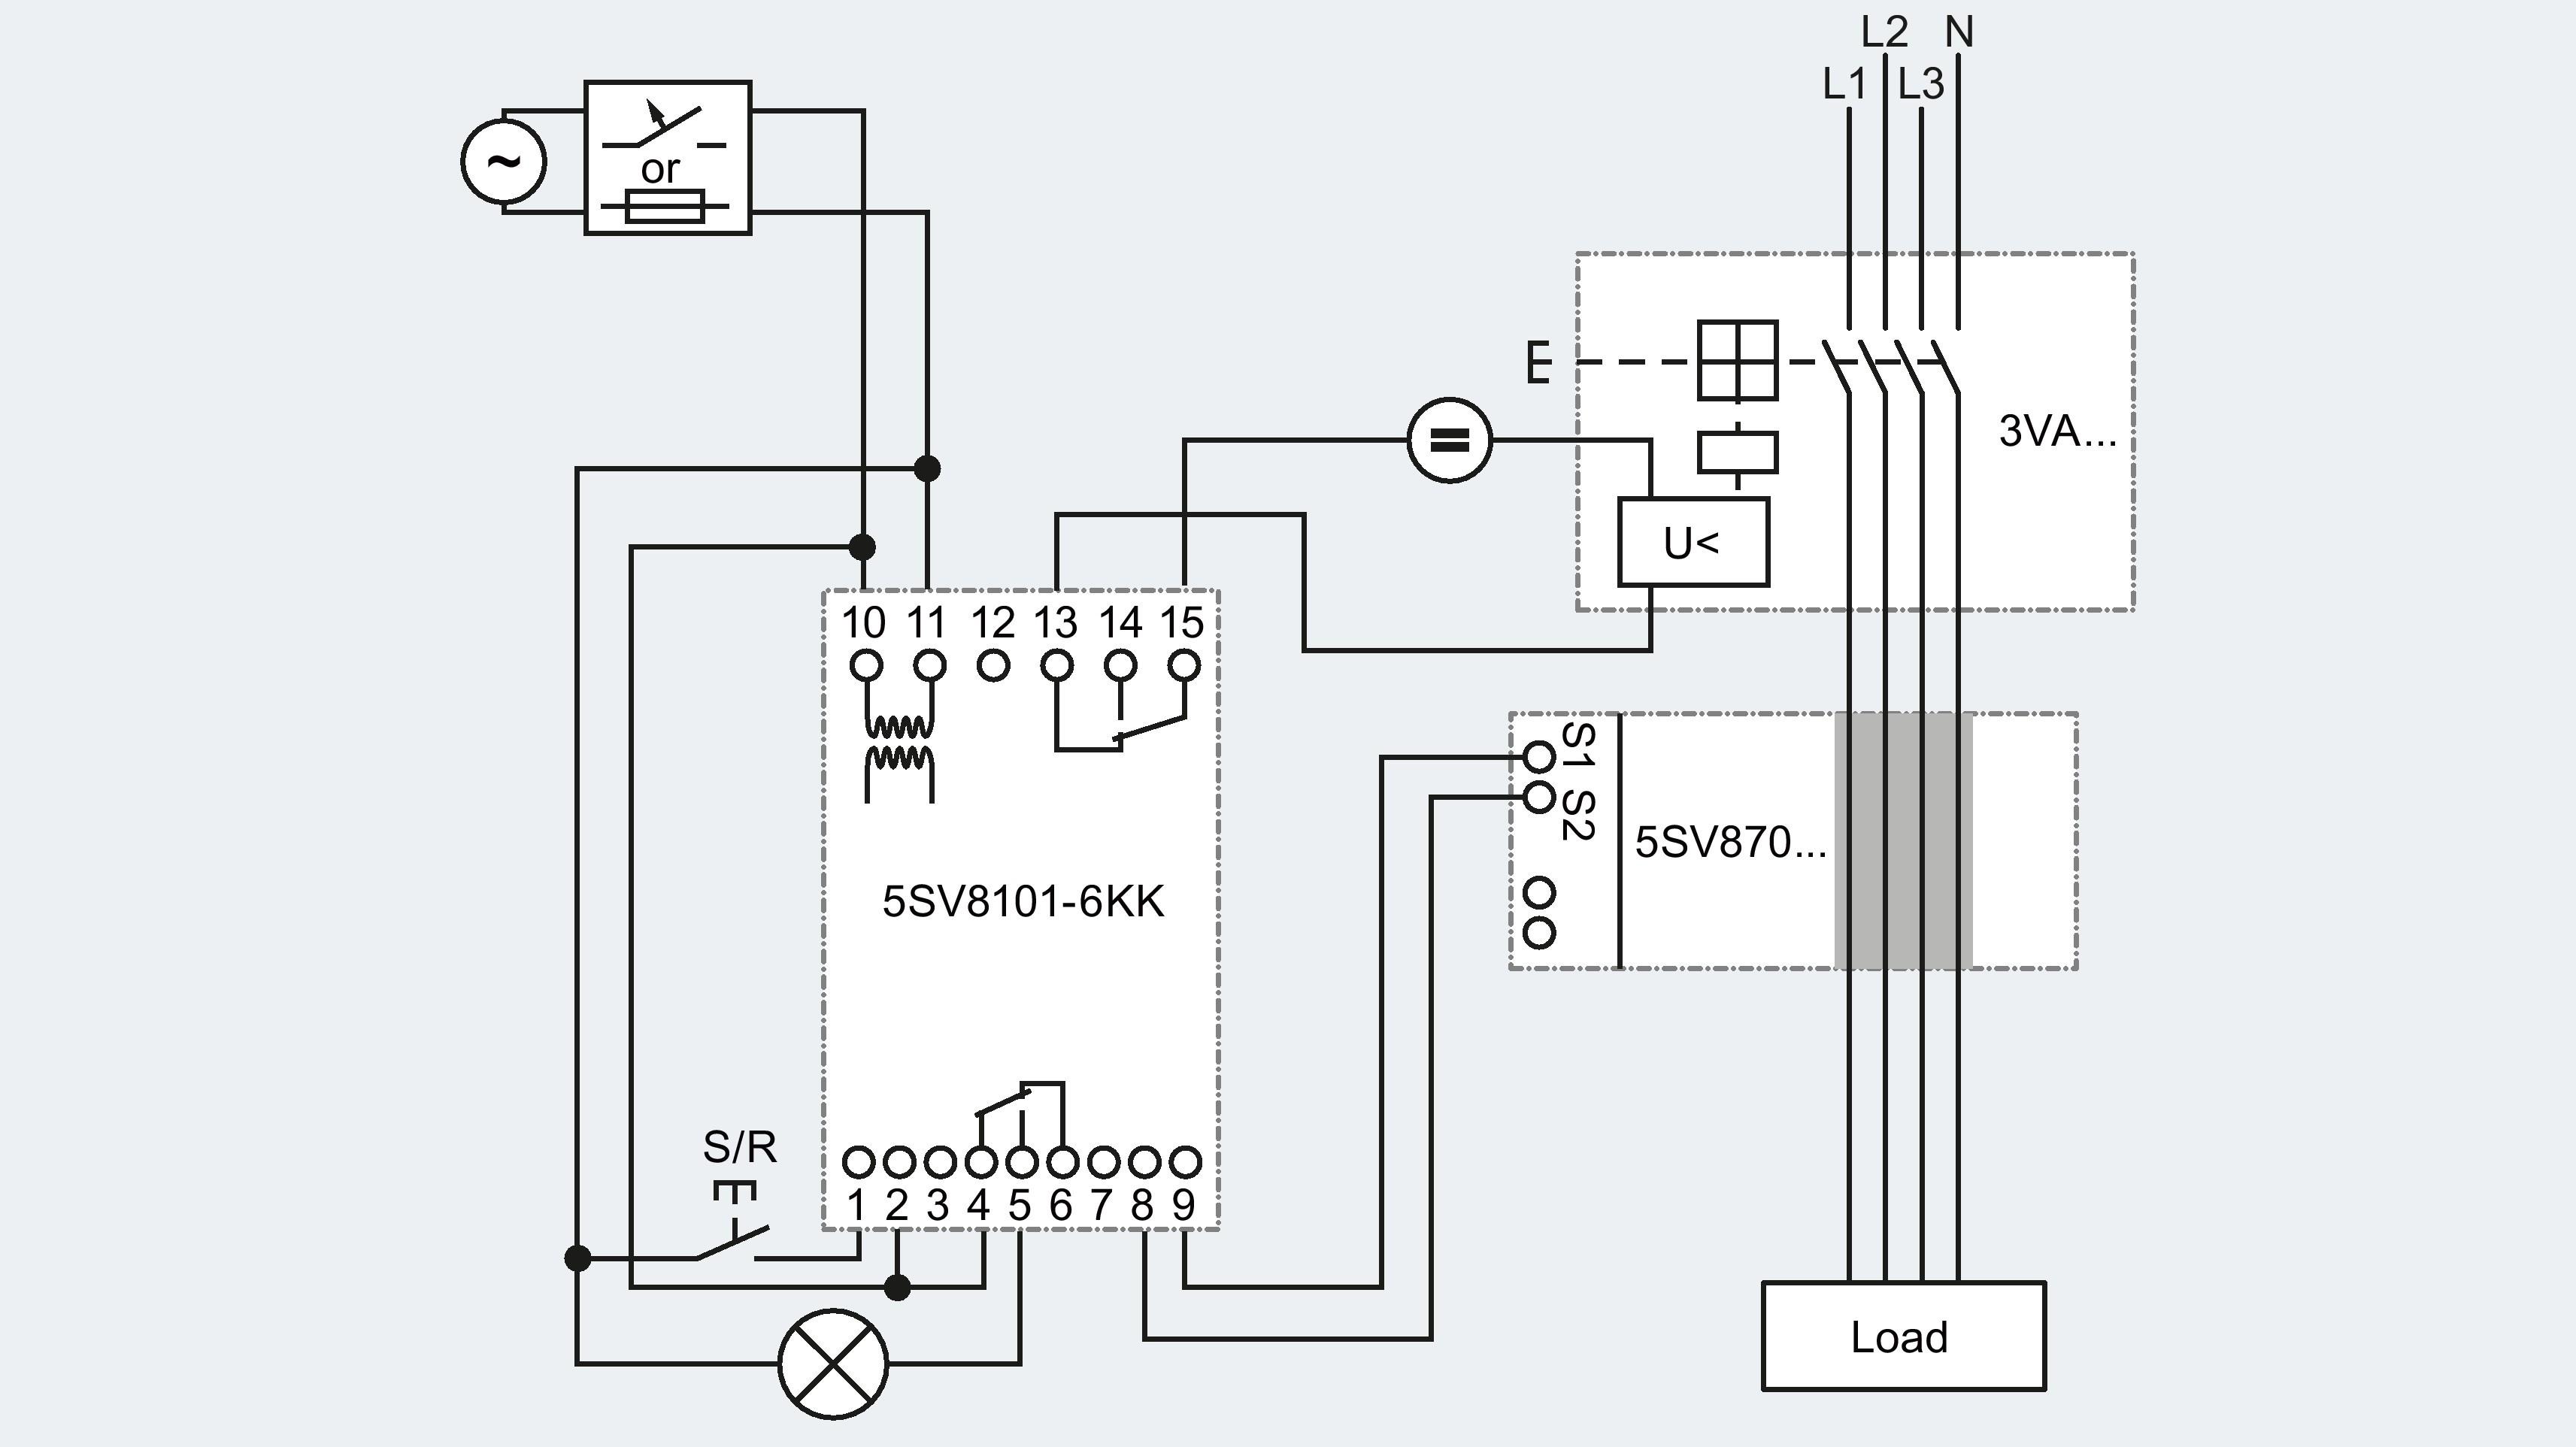 Square D Shunt Trip Breaker Wiring Diagram Siemens Shunt Trip Breaker Wiring Diagram Gallery Of Square D Shunt Trip Breaker Wiring Diagram